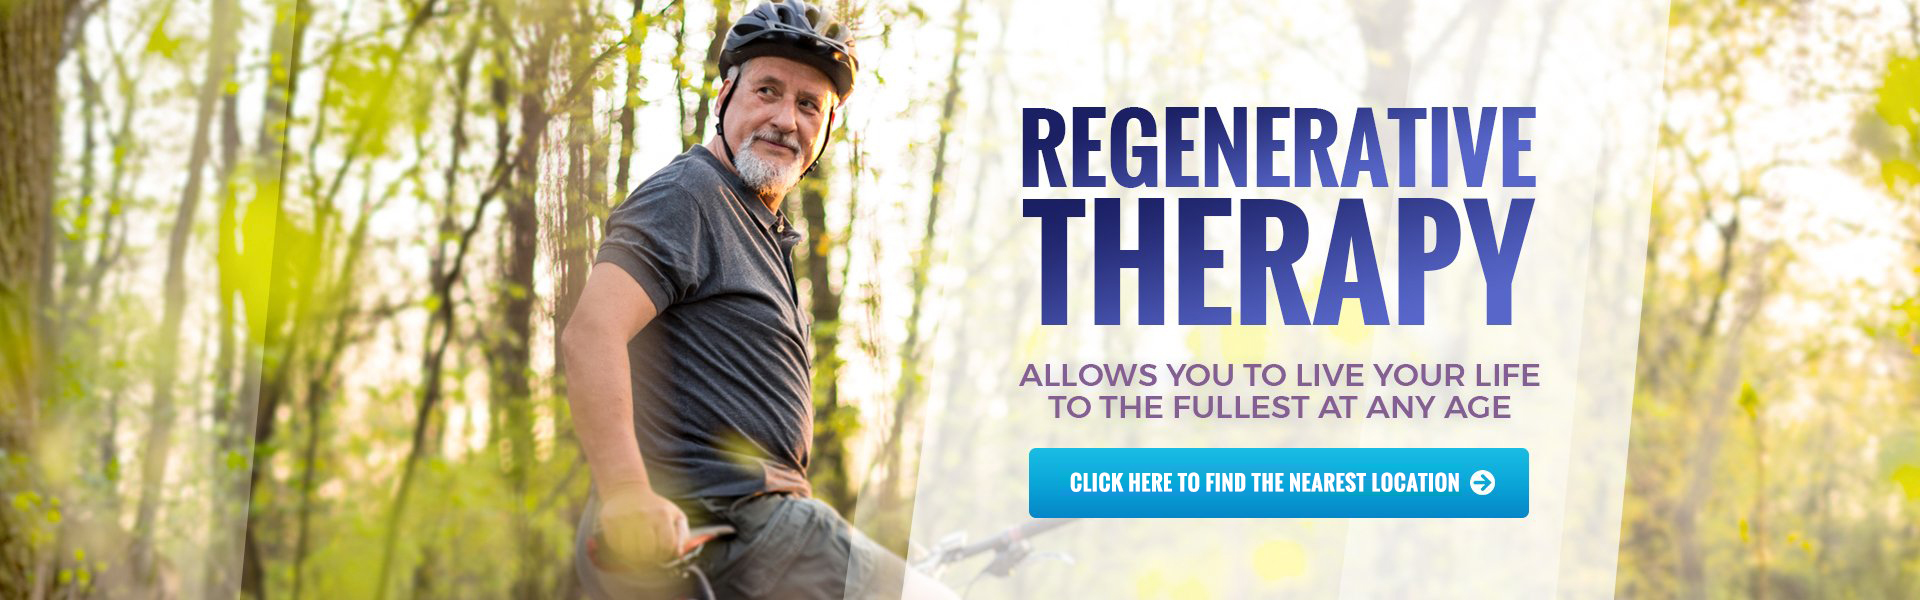 Regenerative Therapy